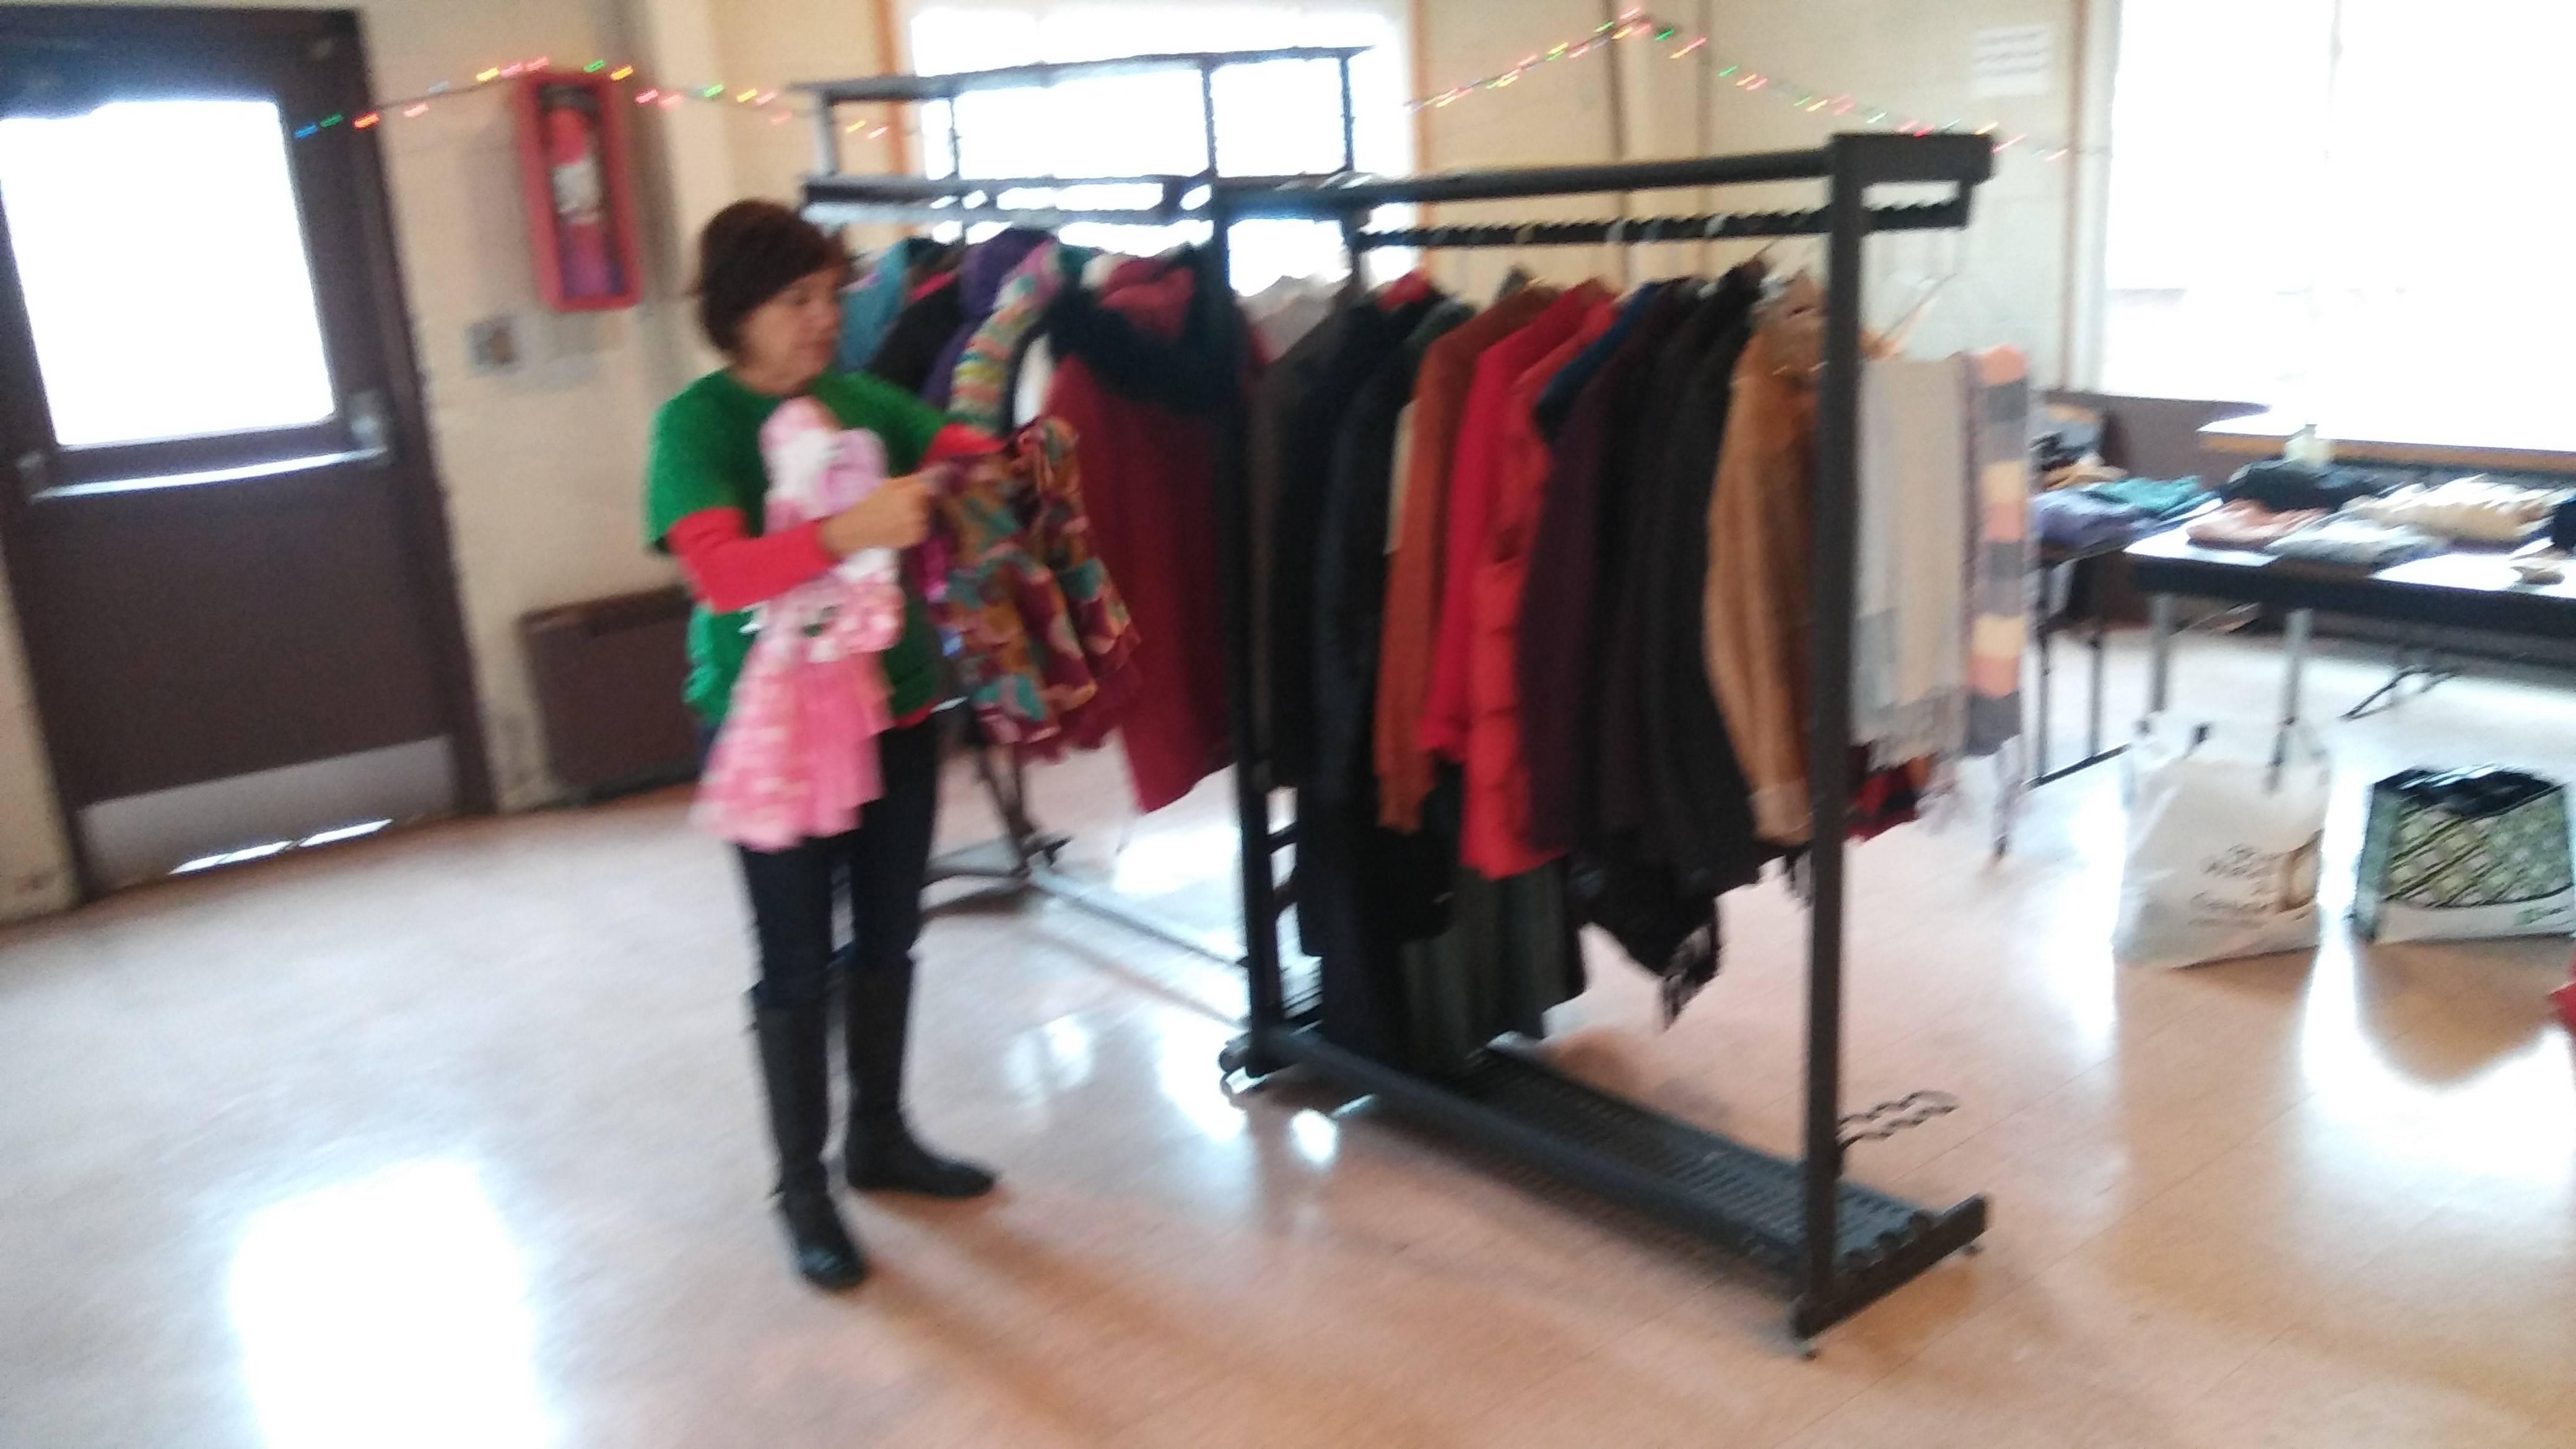 ce6a2417791363fb1820_Soup_kitchen_volunteer_Lynne_Fitzpatrick_sorting_through_clothing.jpg